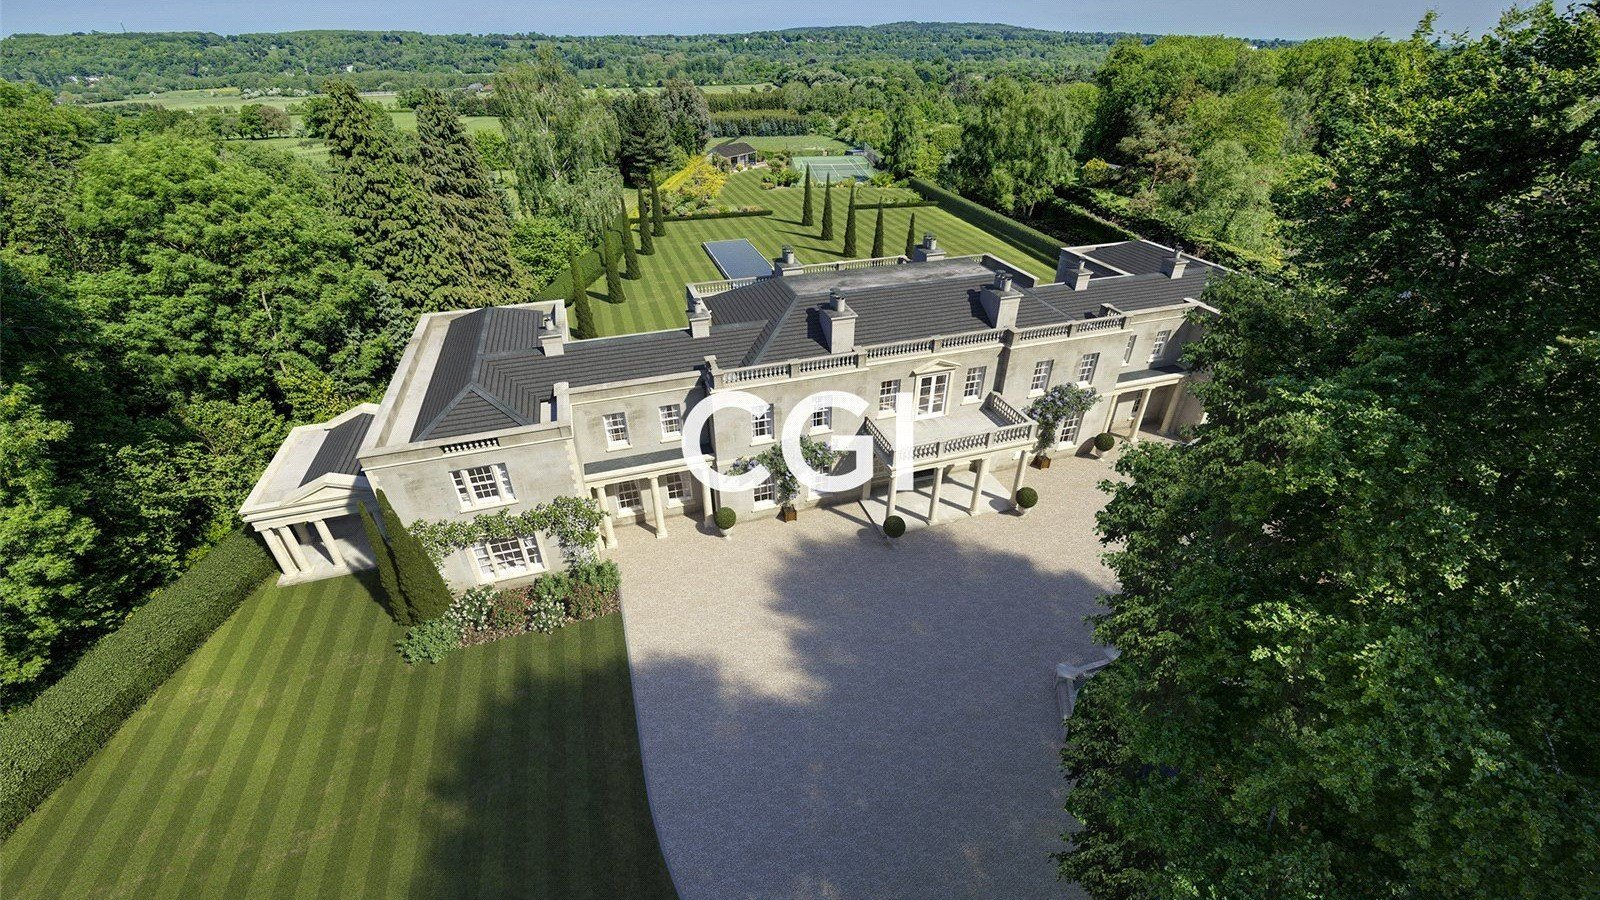 Property for Sale Harpsden Woods, Harpsden, Henley-on-Thames RG9